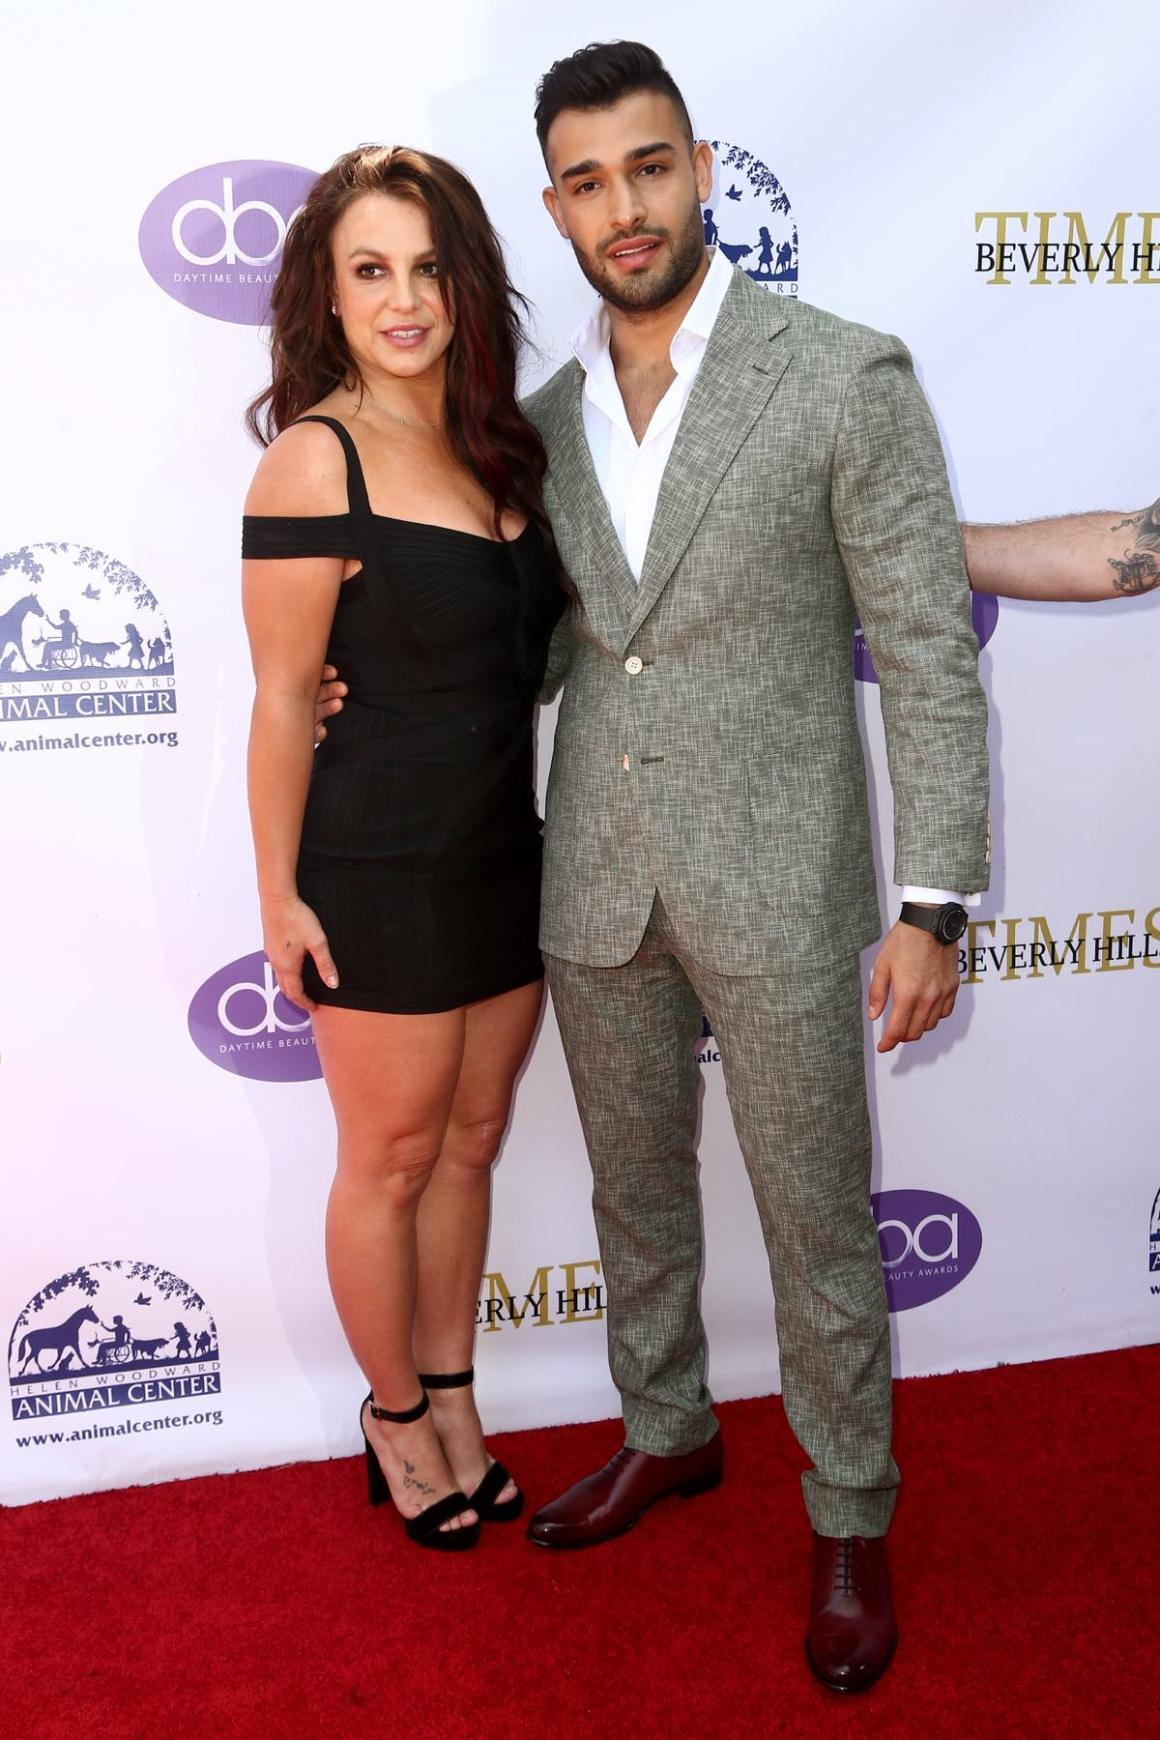 Britney Spears and Sam Asghari 2019 Daytime Beauty Awards